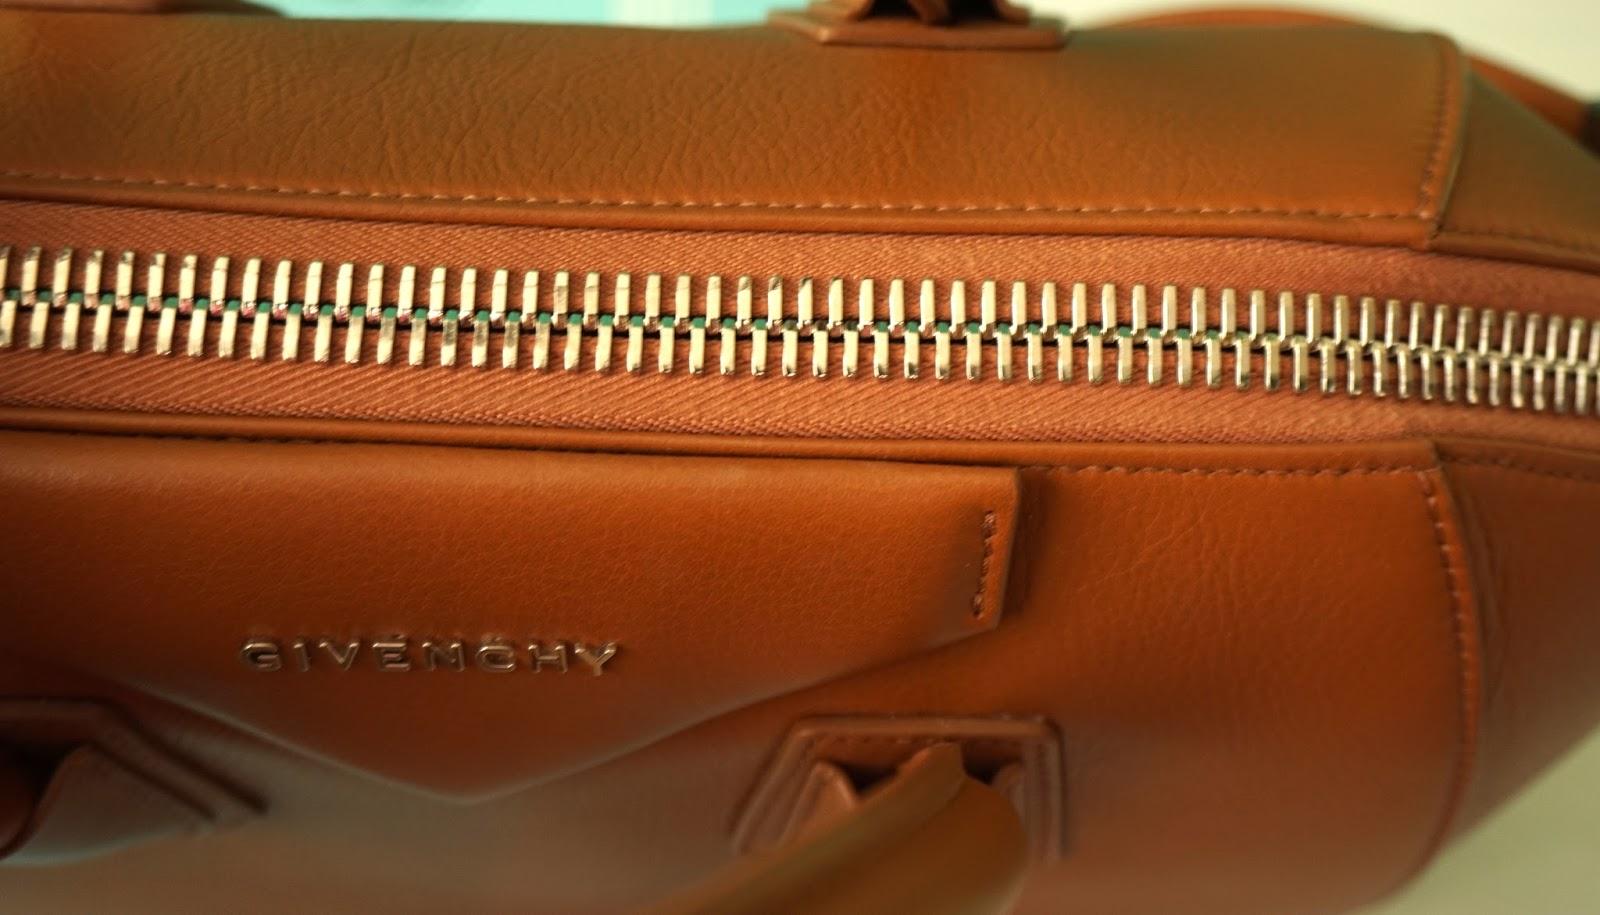 8c490f419fff Bag Review  Givenchy Antigona Medium Metal Edge in Hazel + Spot A Fake  Givenchy Antigona